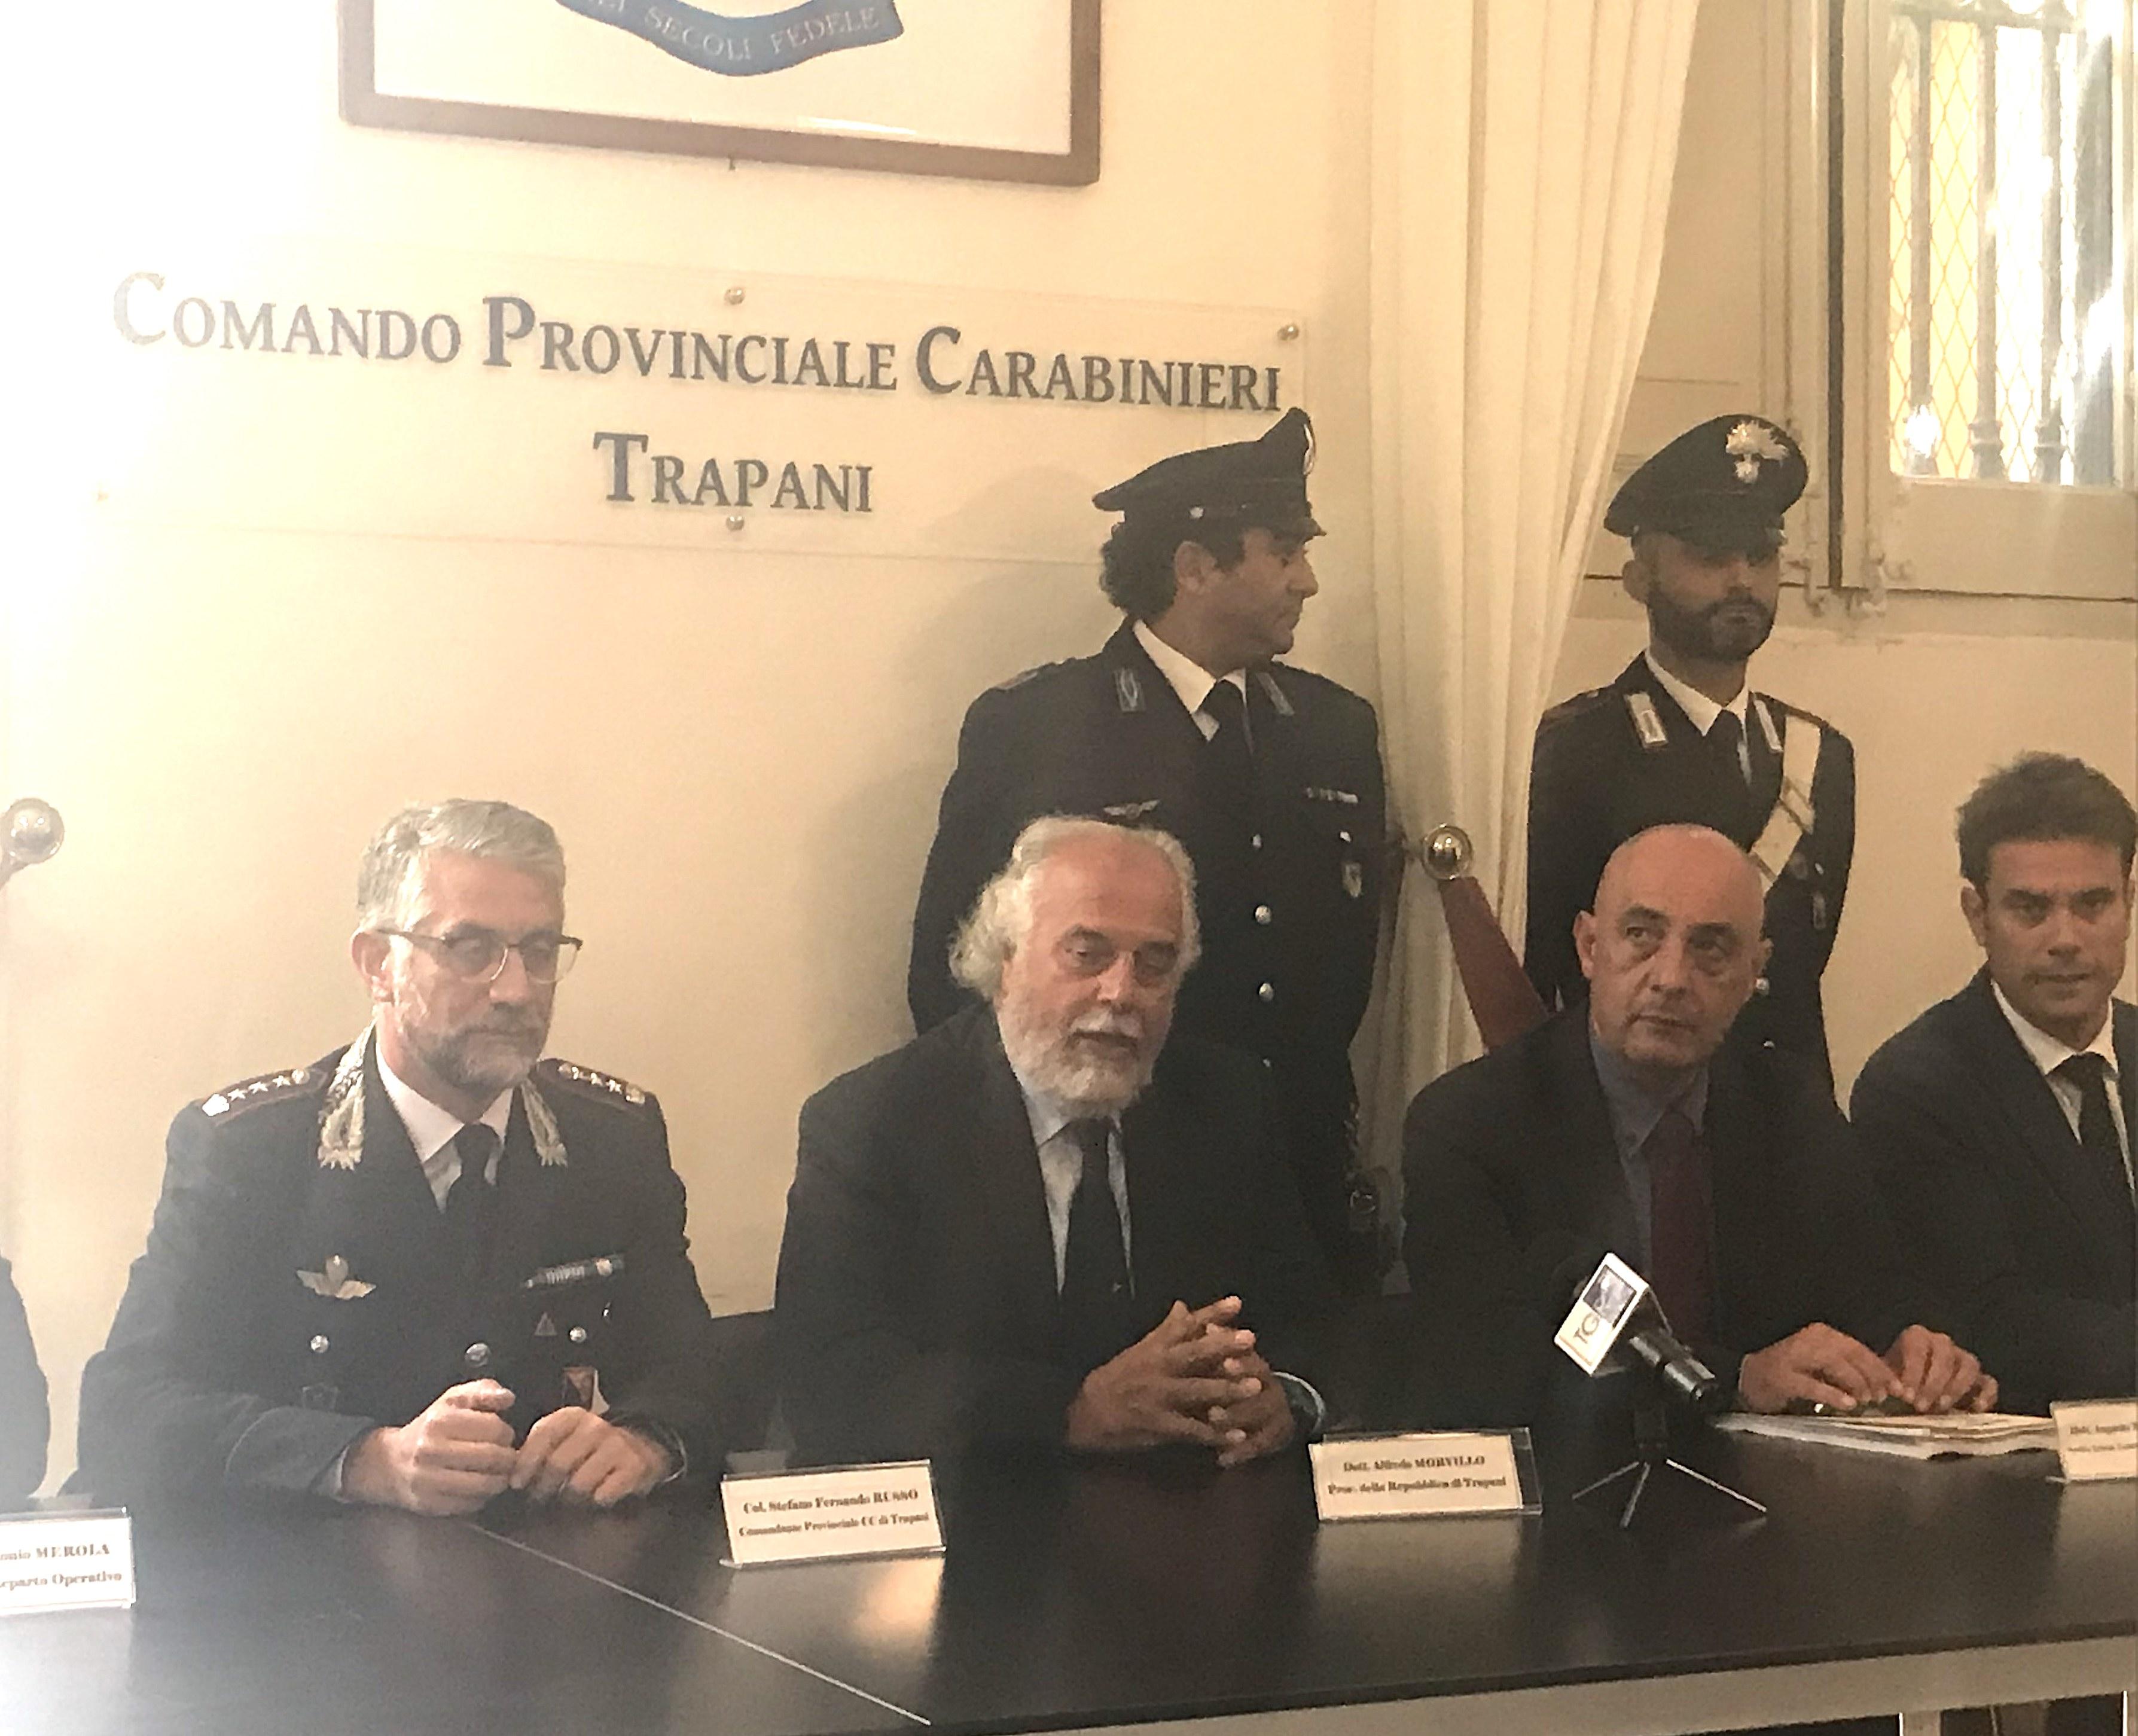 Catturati i tre evasi dal carcere di Favignana